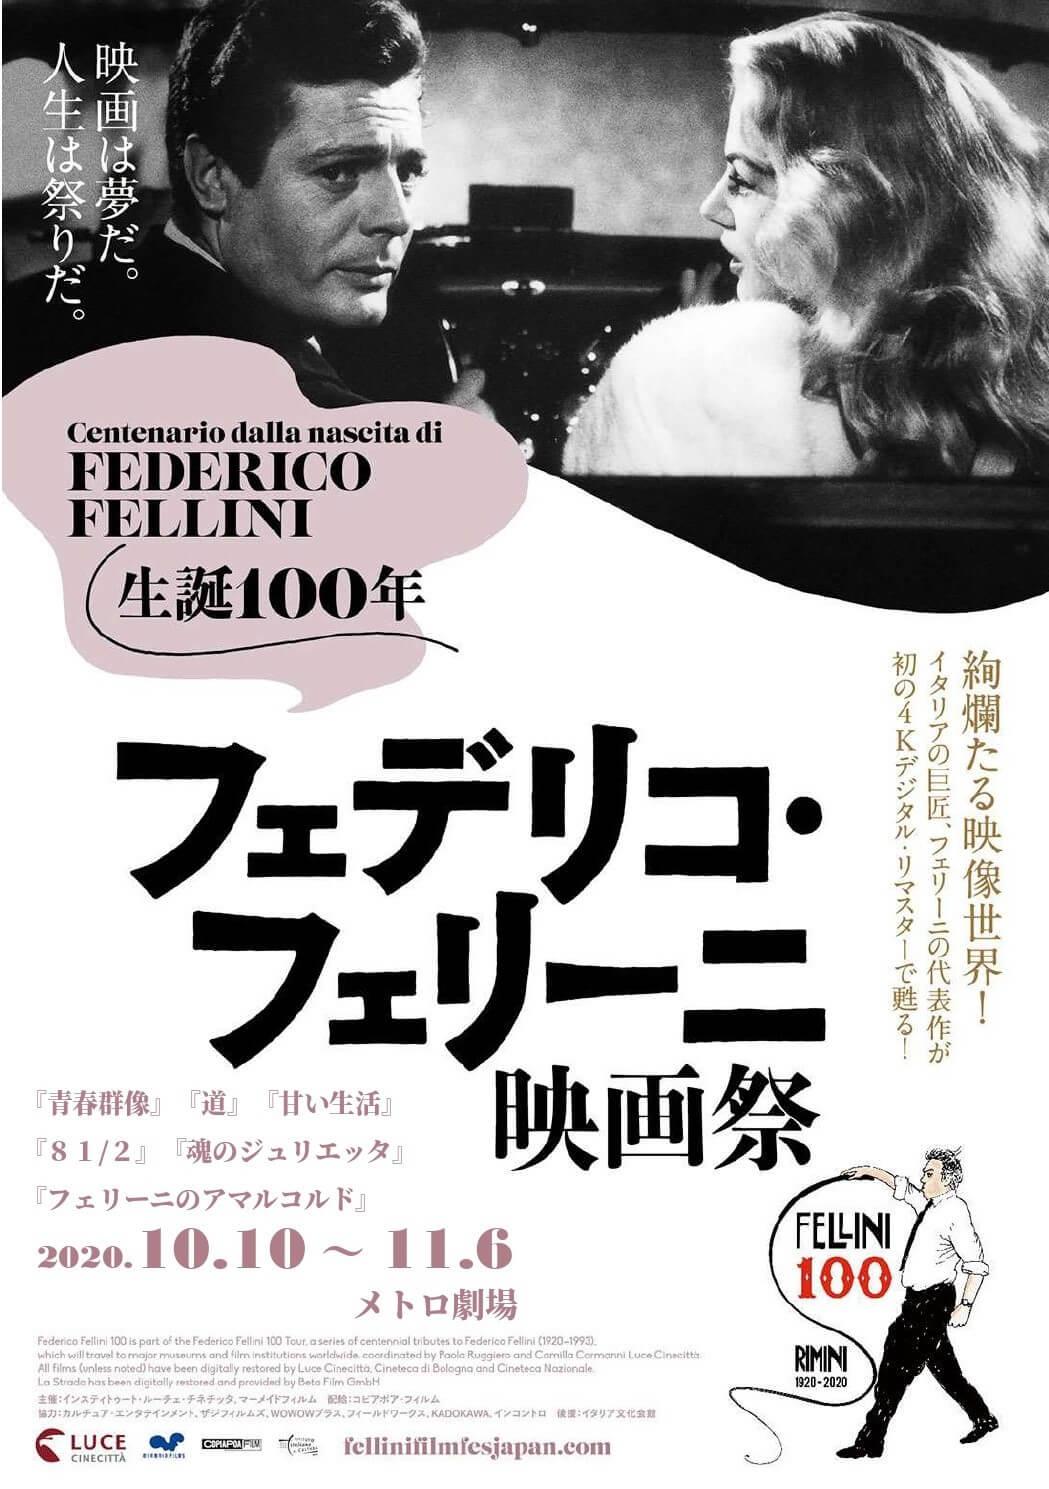 Fellini_fes_20200820091939978.jpg